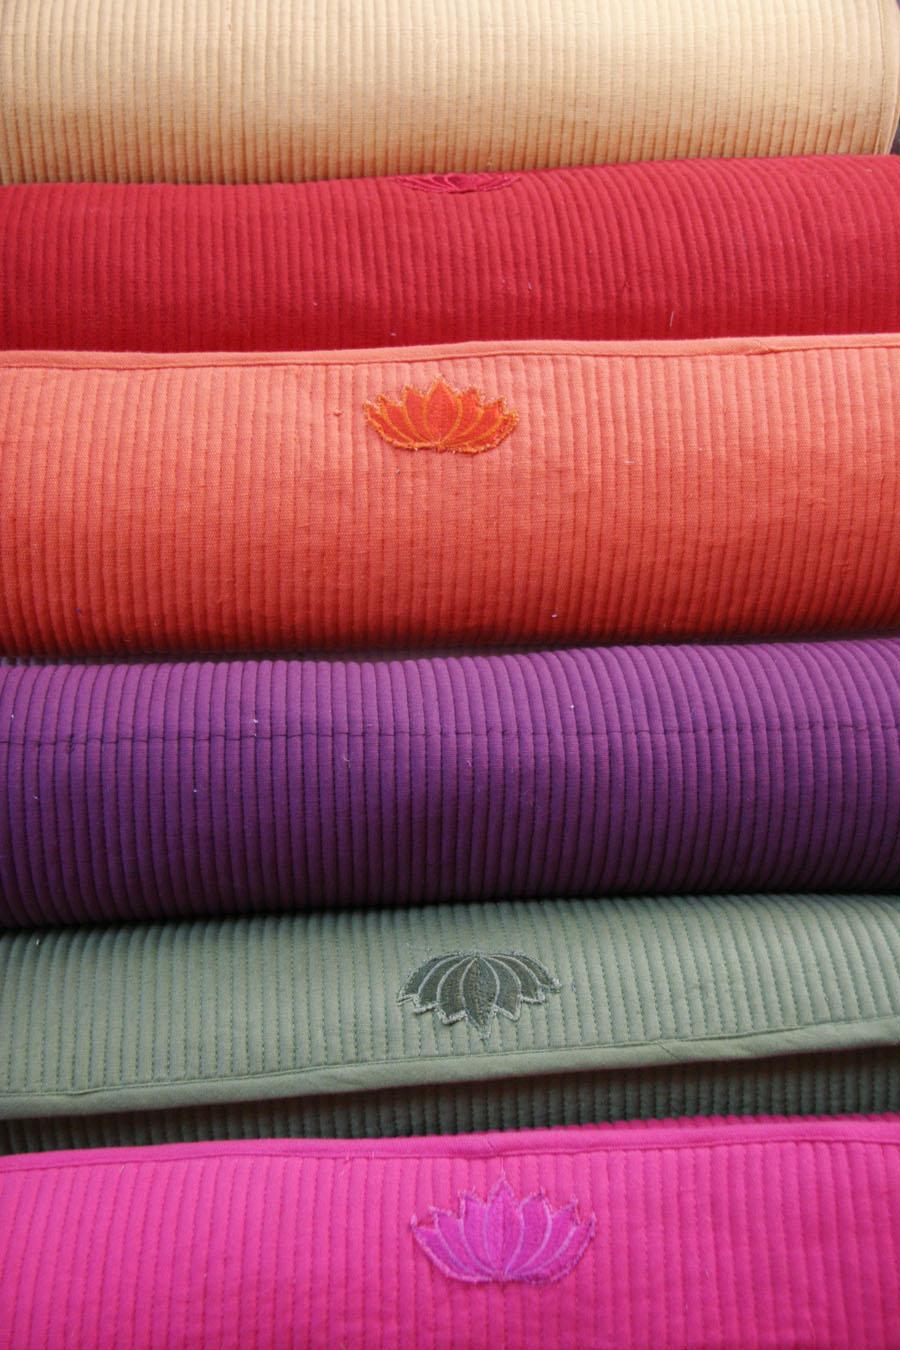 Handmade Cotton Yoga Mats & Bags